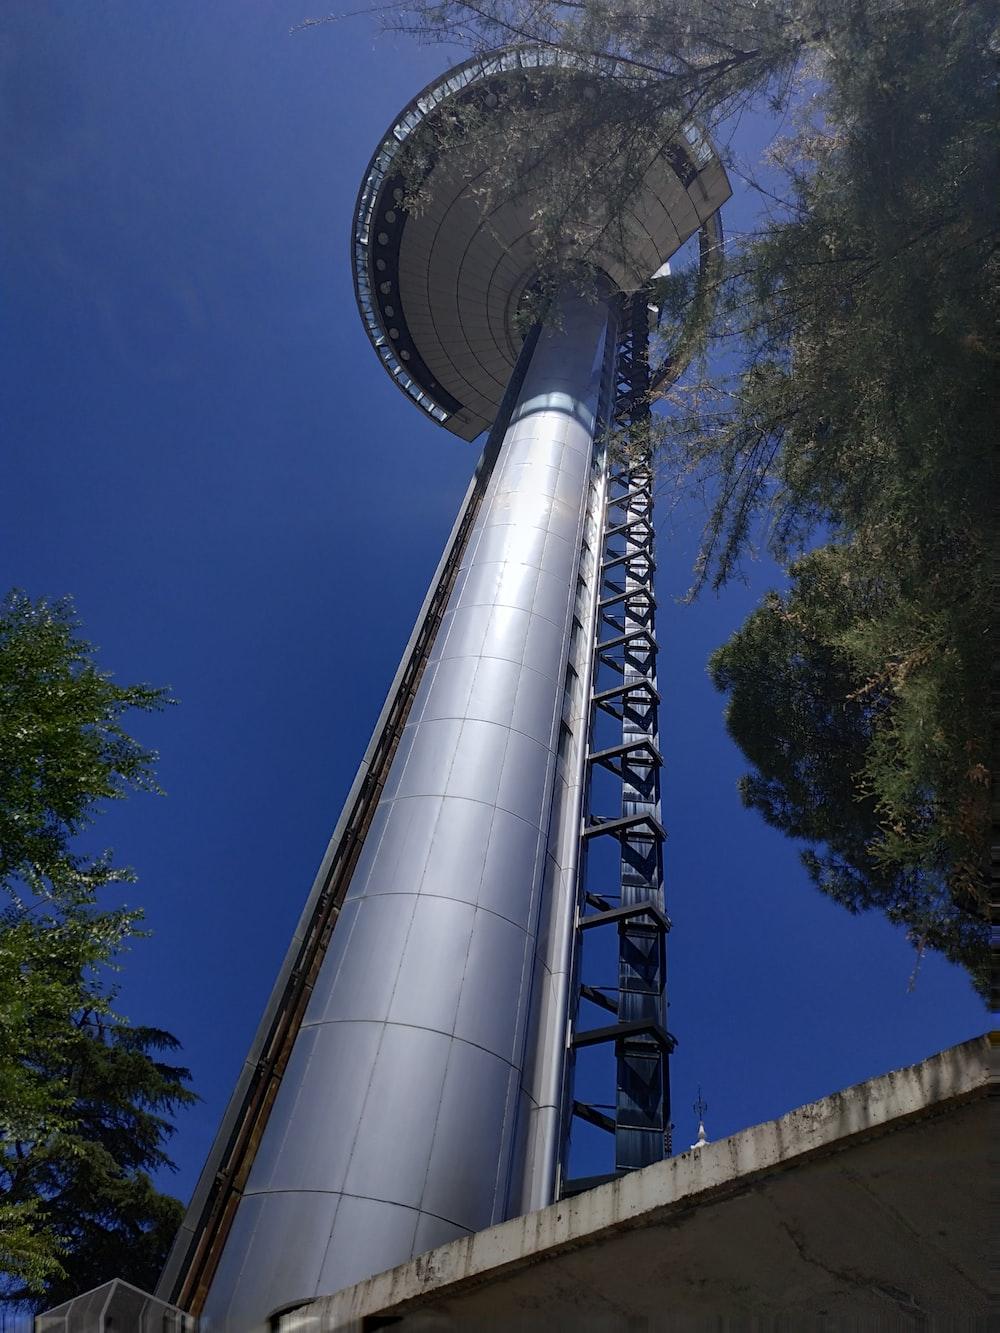 grey concrete tower